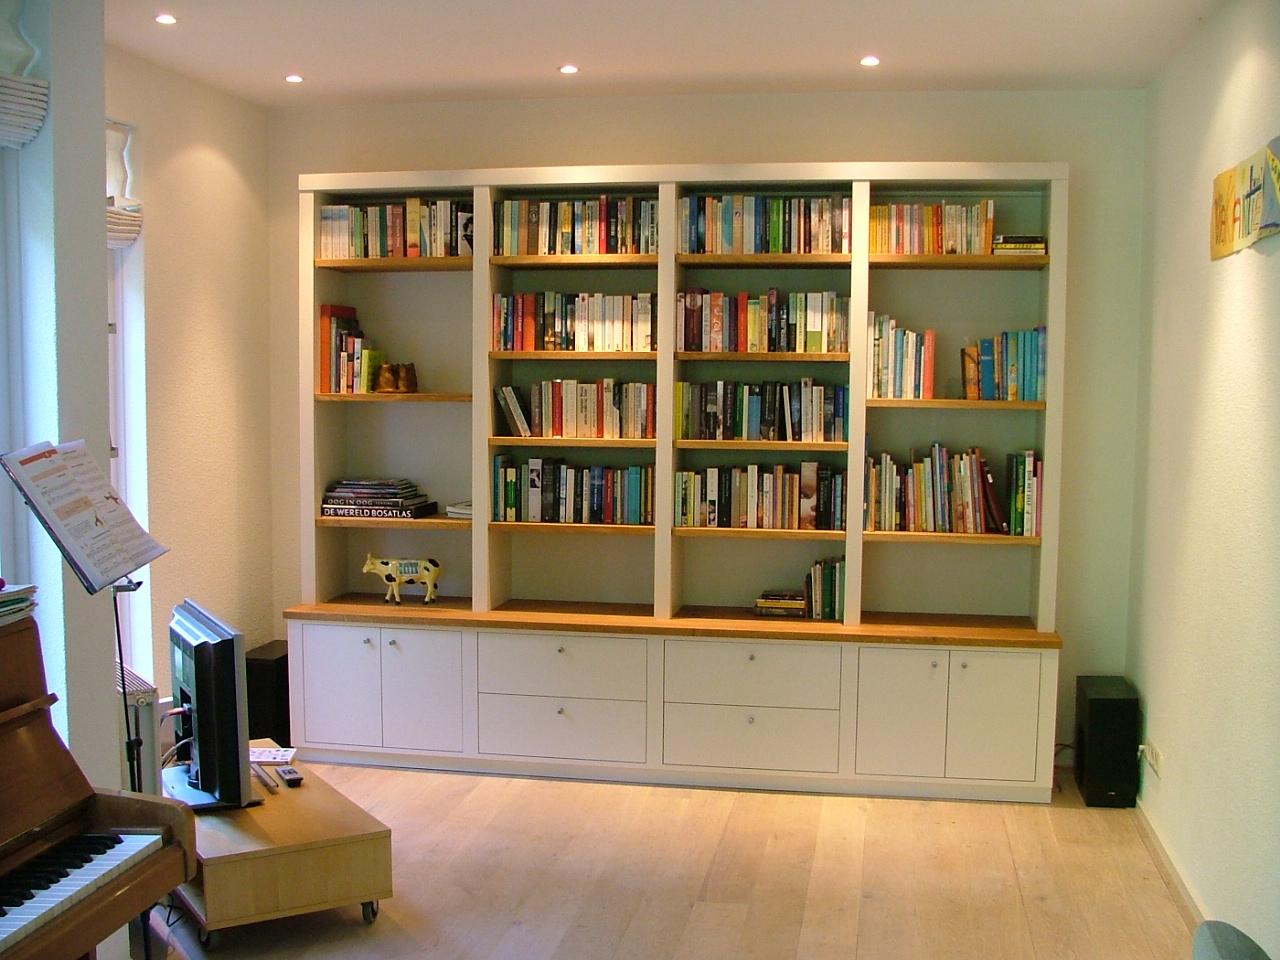 Witte boekenkast, op maat gemaakt met kastjes.